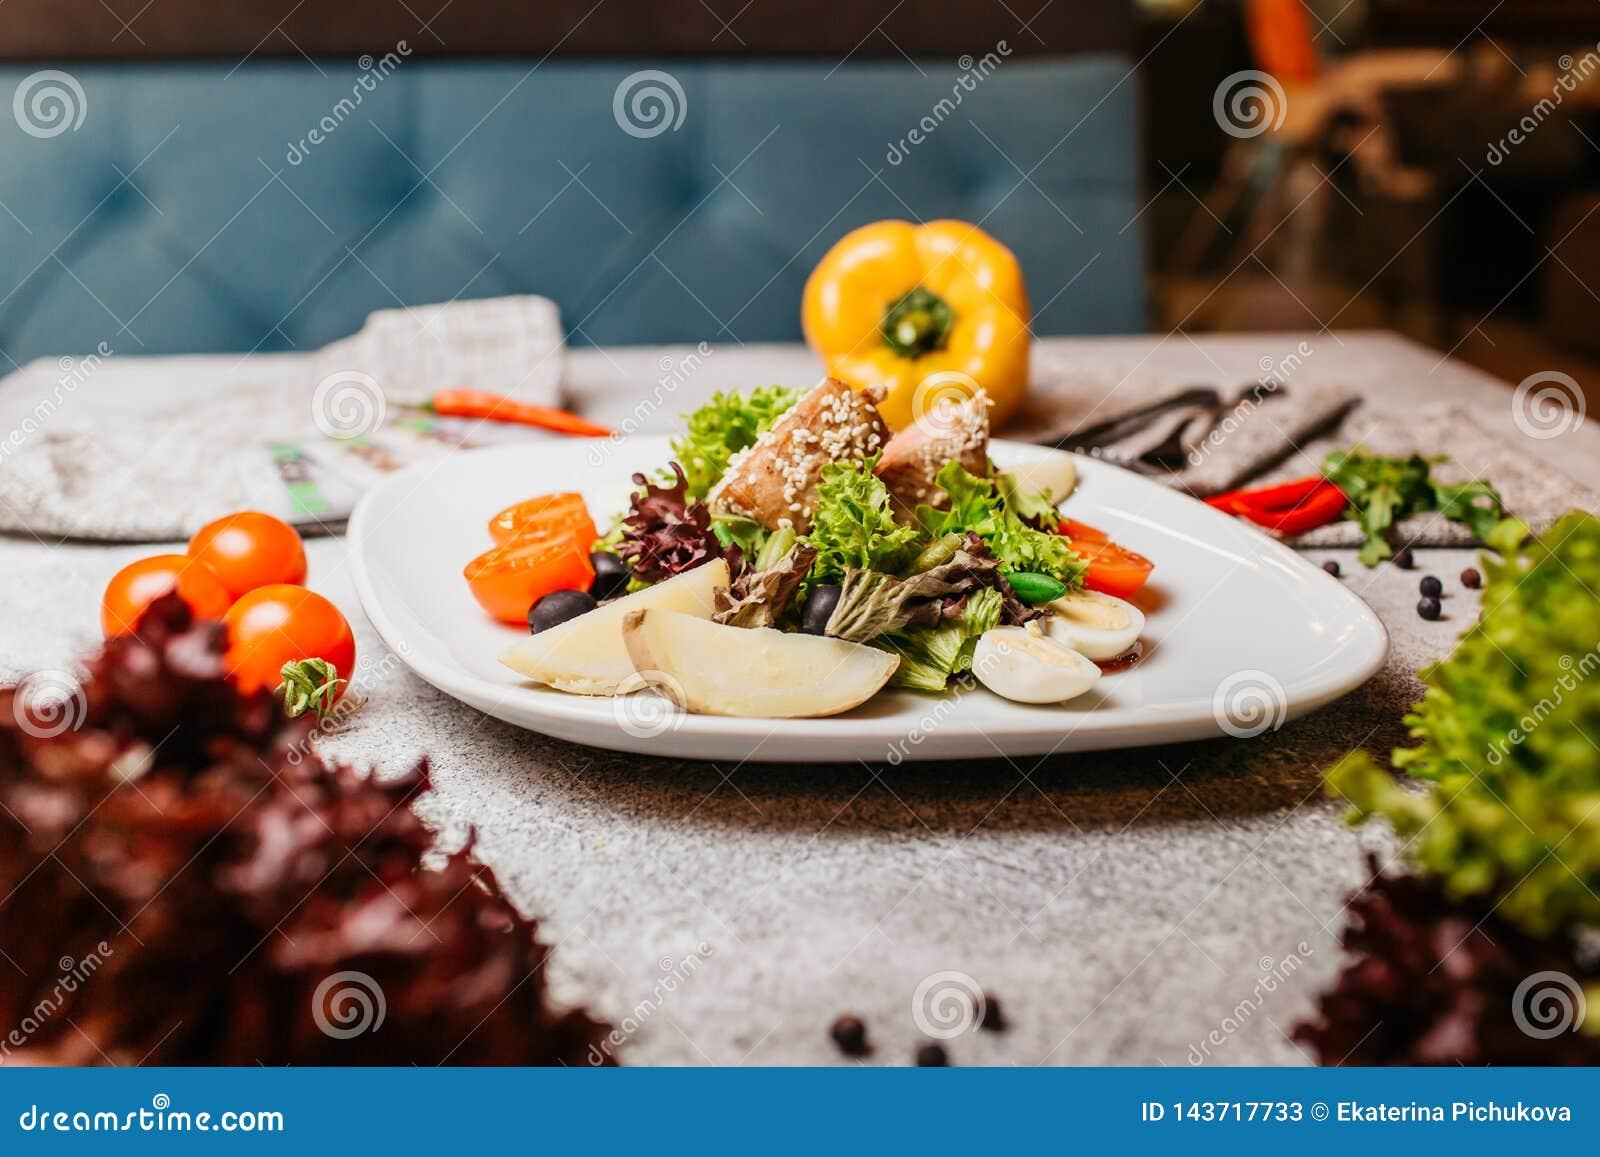 Salade de viande avec des l?gumes